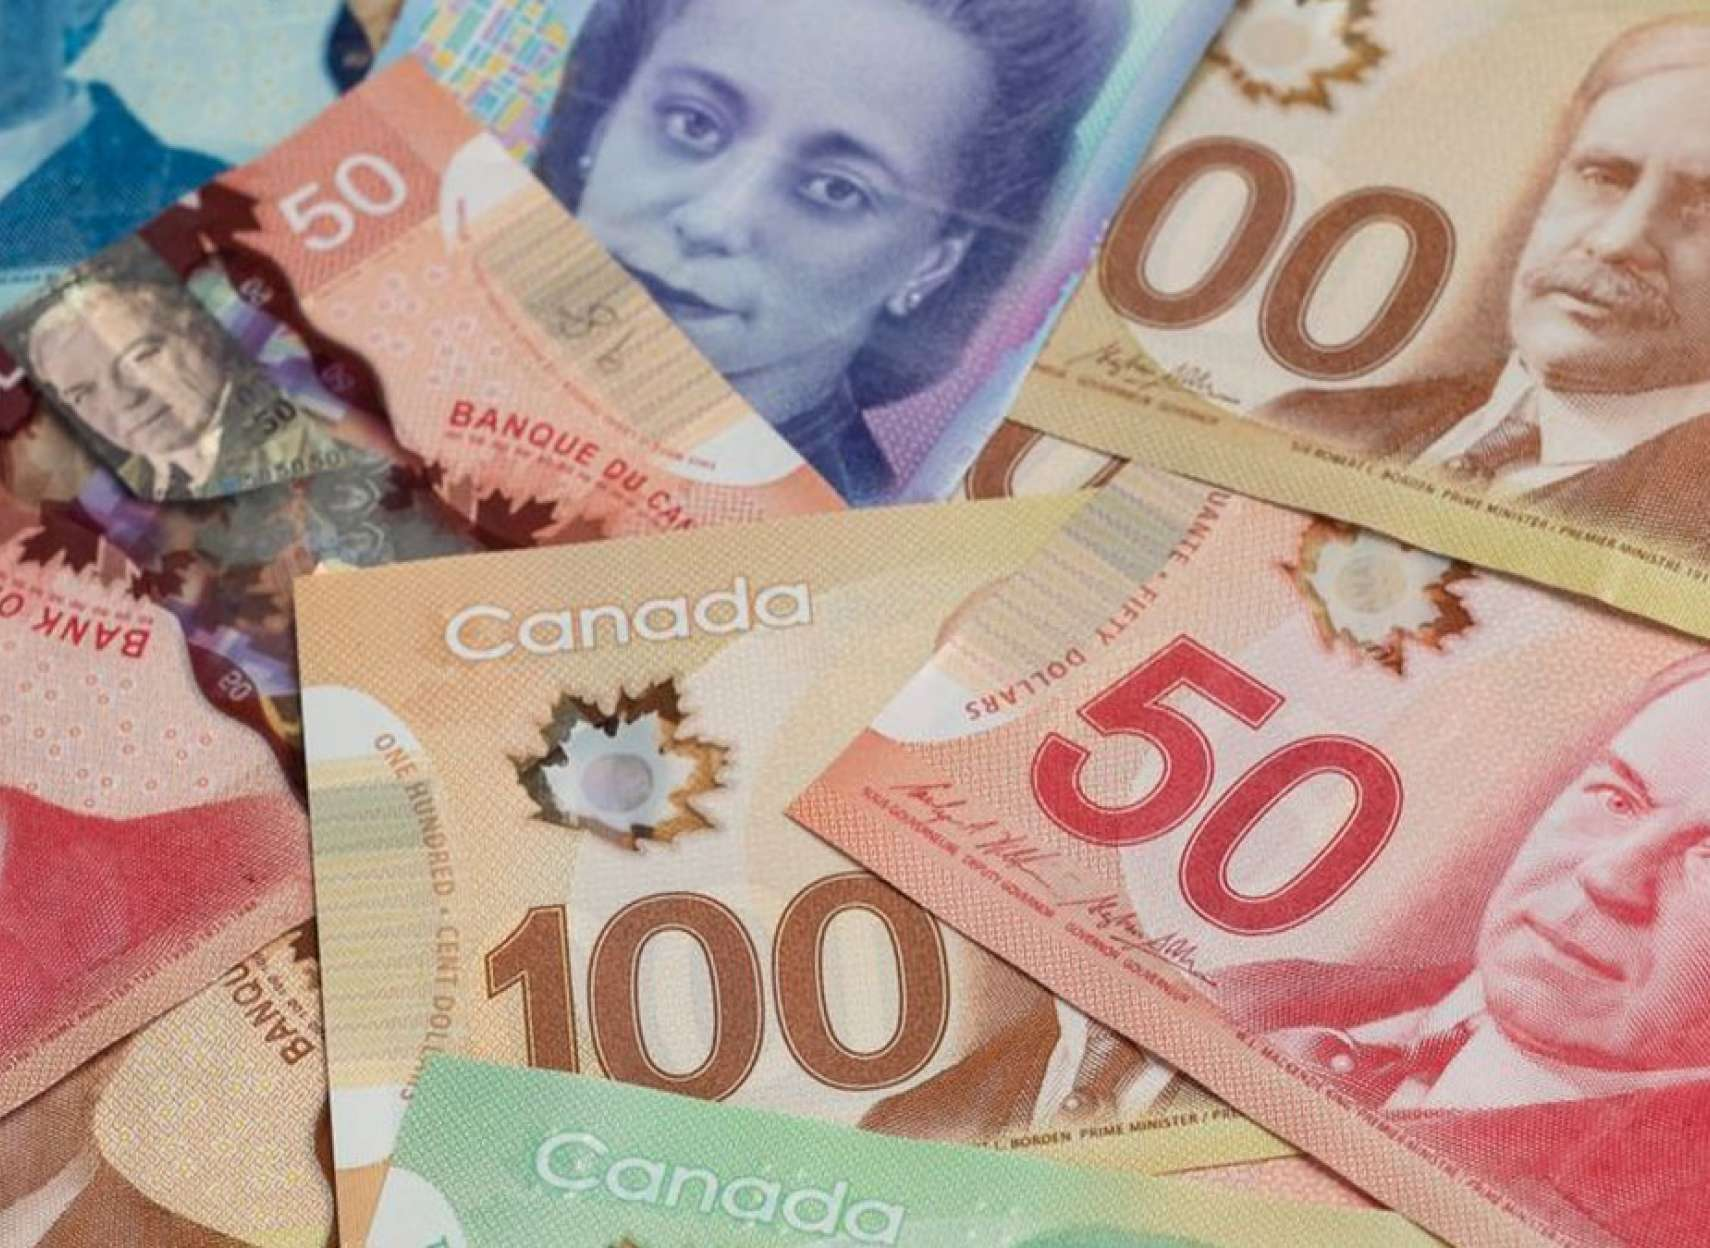 اخبار-کانادا-پرداخت-کمک-اضطراری-2000-دلاری-کانادا-دچار-سکسکه-شد